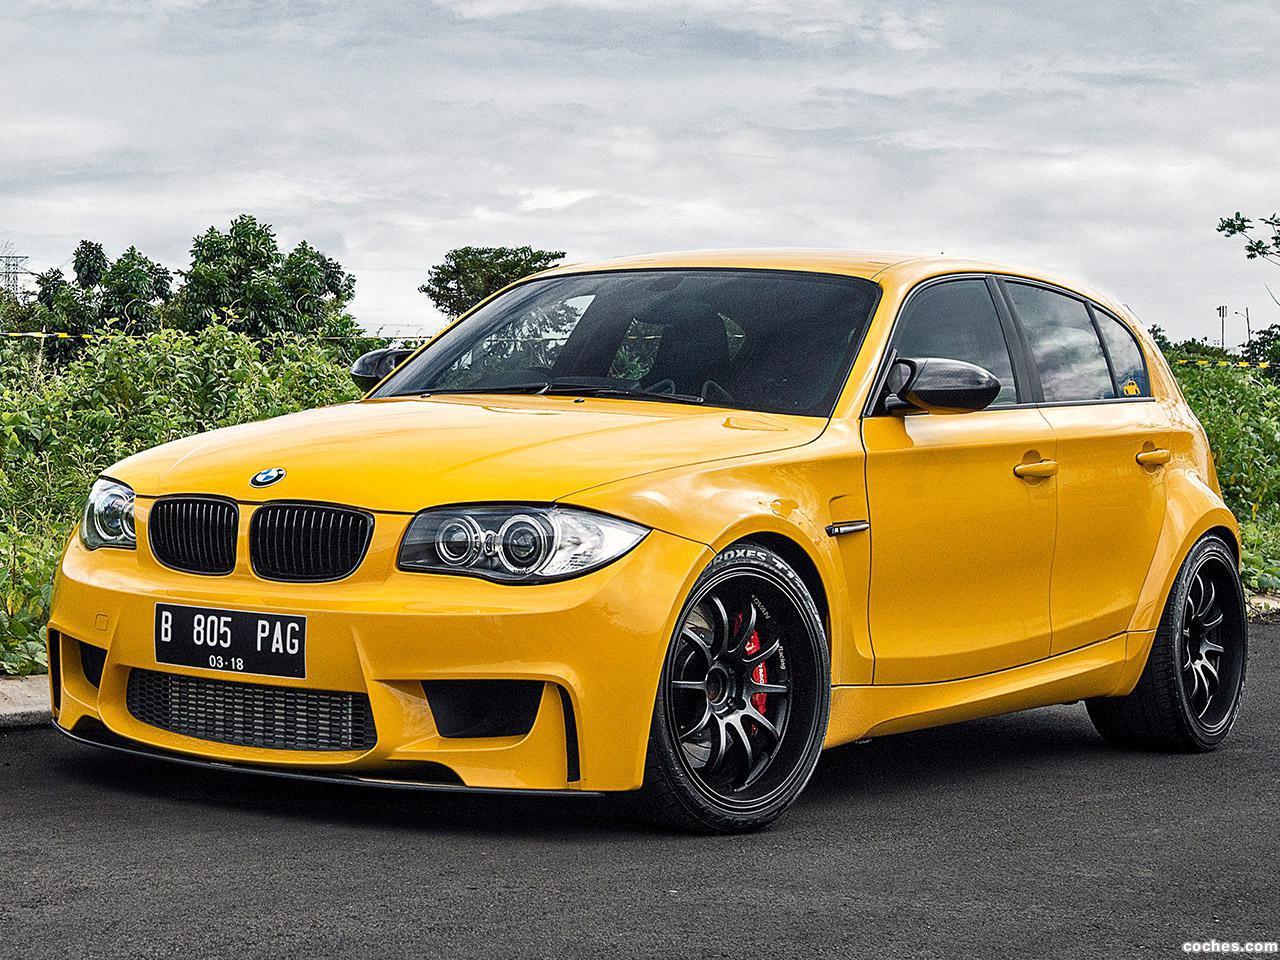 bmw_1-series-m-hatchback-posma-e87-2015_r2.jpg